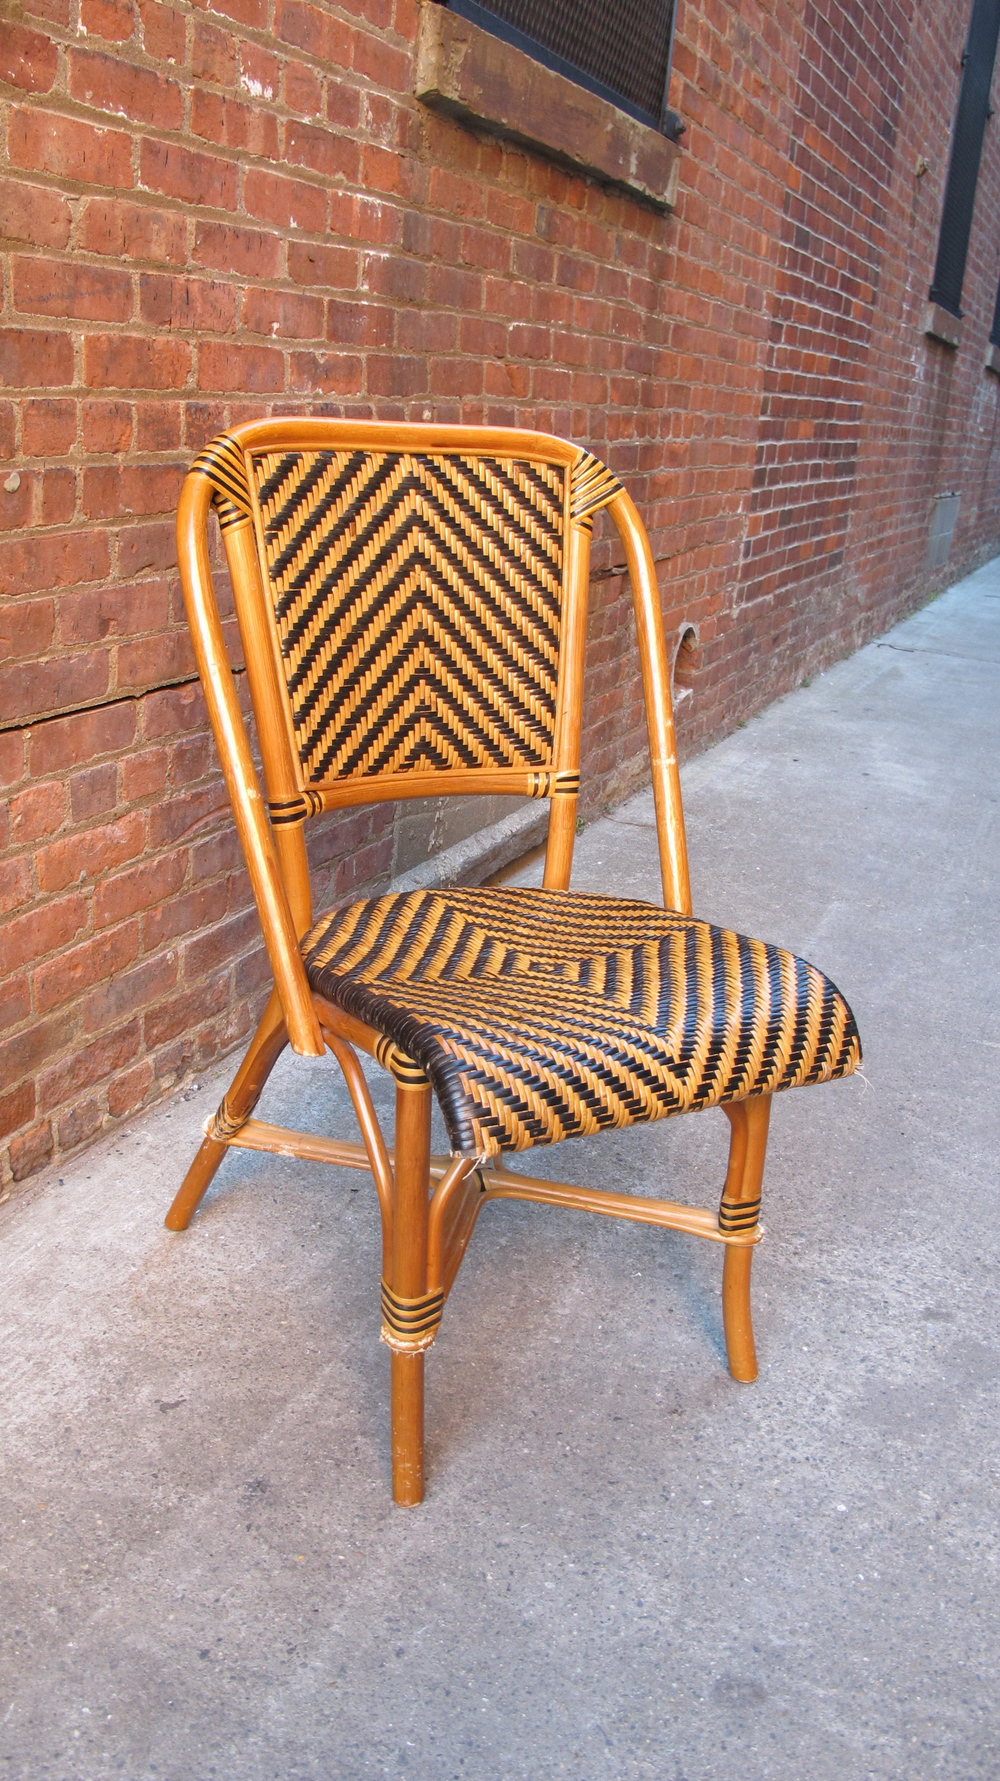 Woven Stripe Chair $50